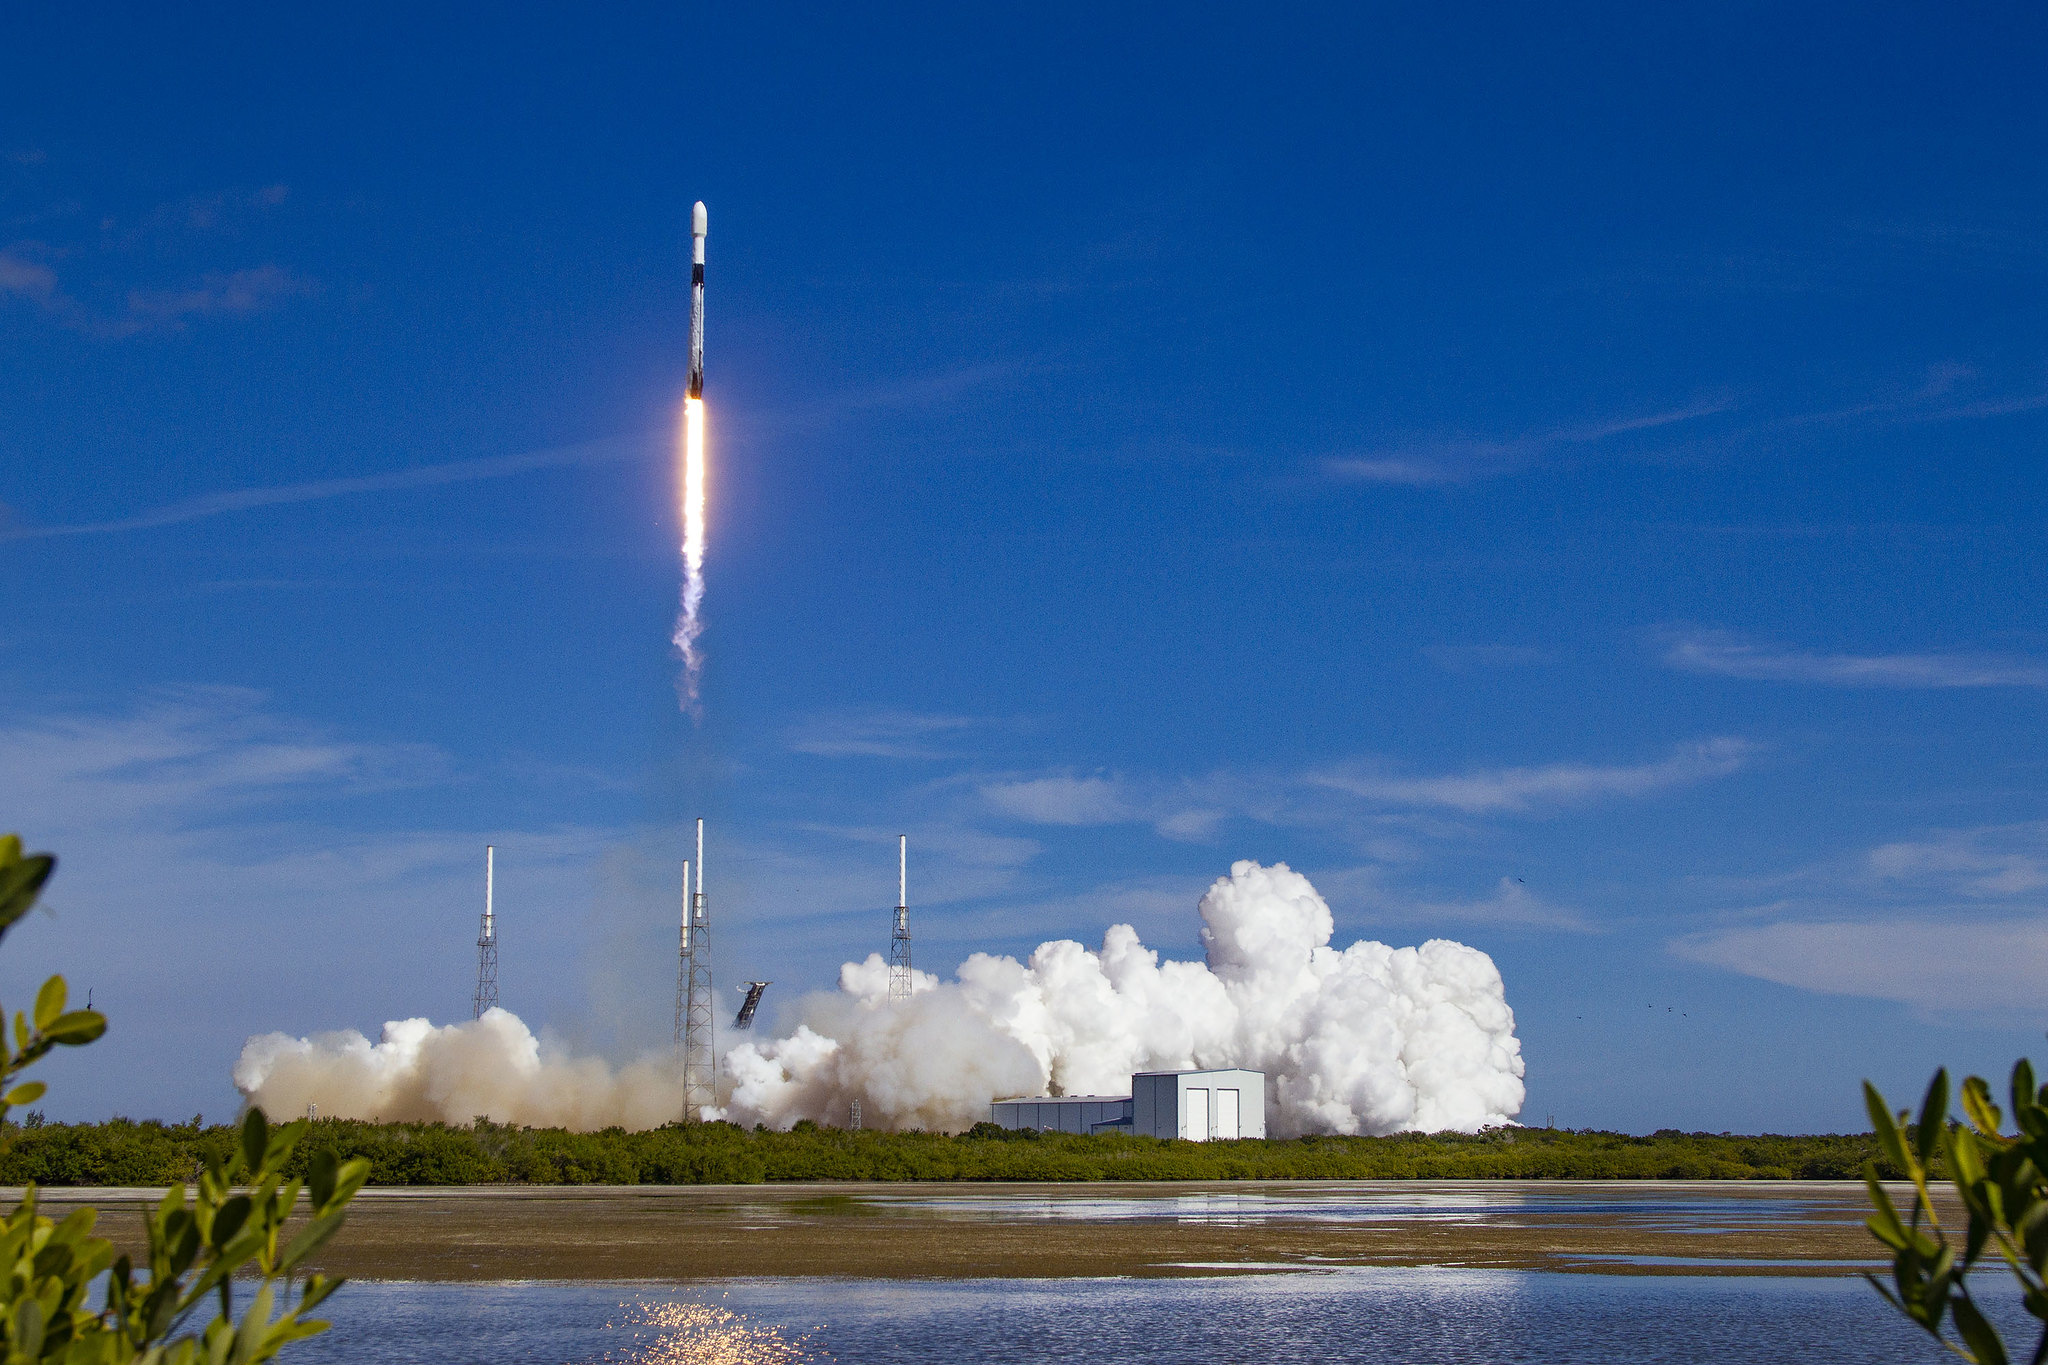 Imaginea 1: Lansarea rachetei Falcon 9 B1051 cu satelitul Sirius SXM-7 (Sursa foto: SpaceX)